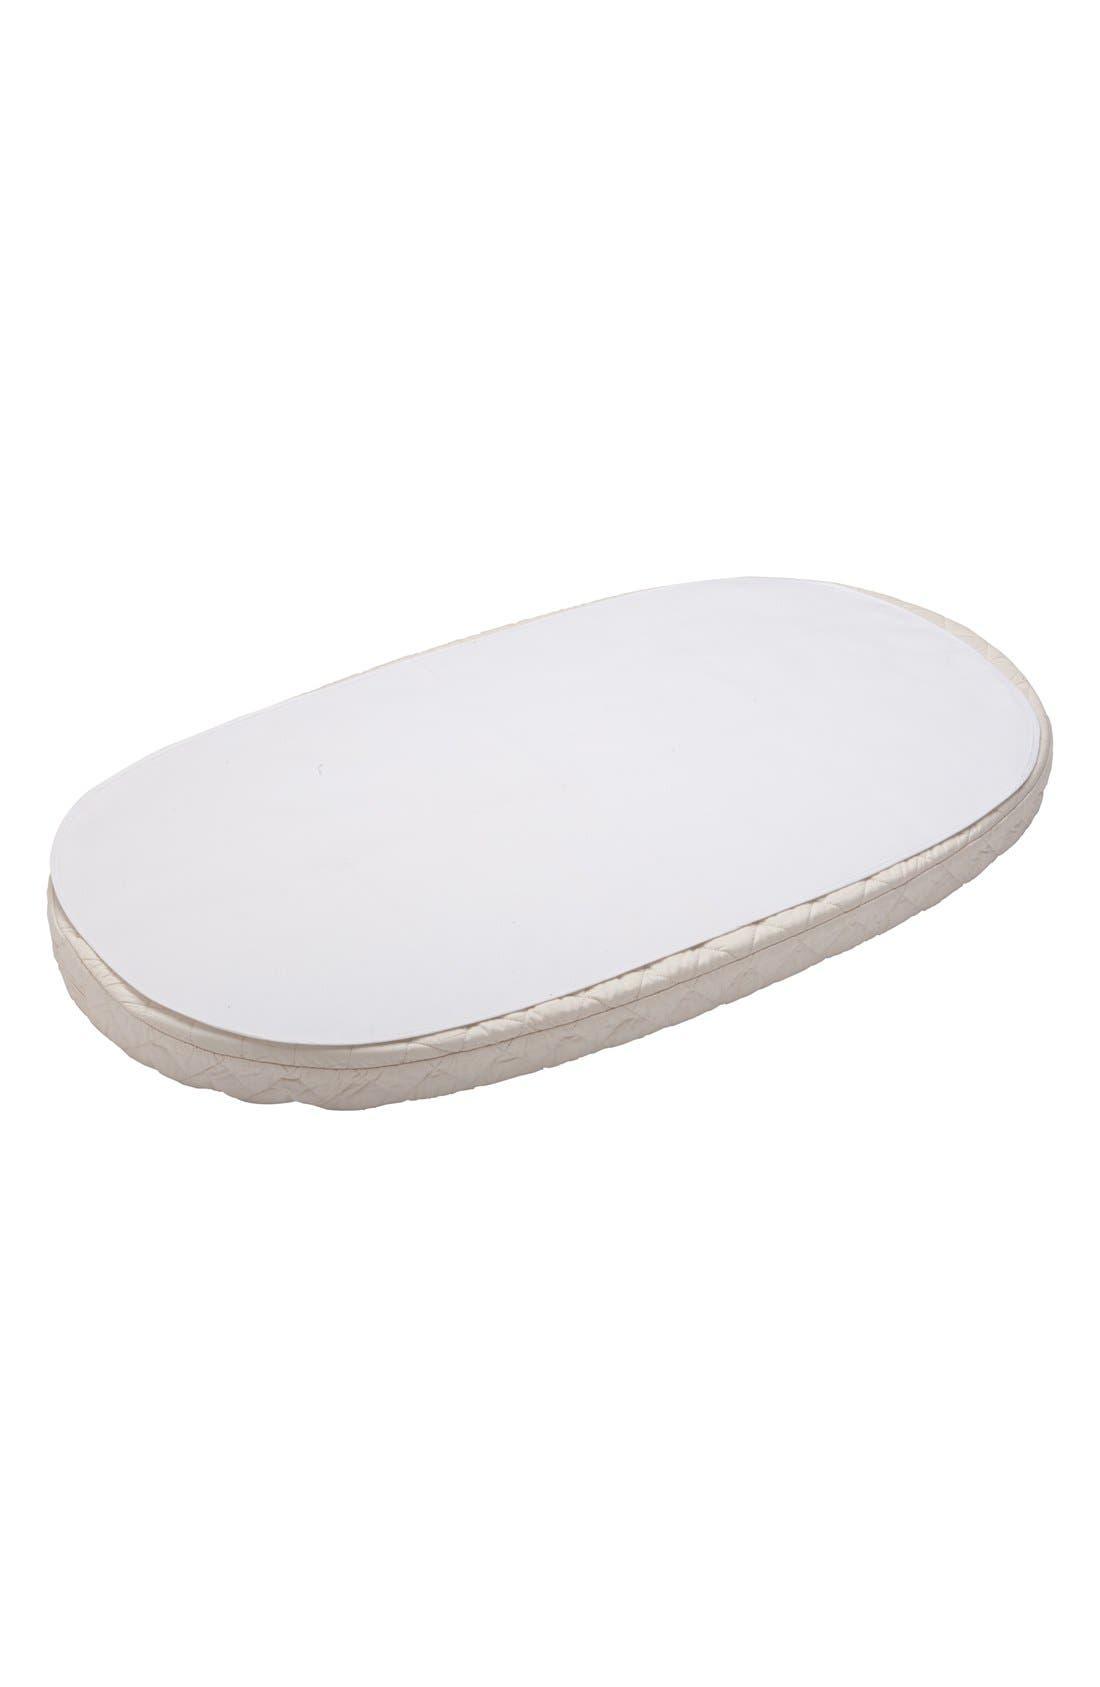 STOKKE Sleepi Waterproof Crib Sheet, Main, color, WHITE